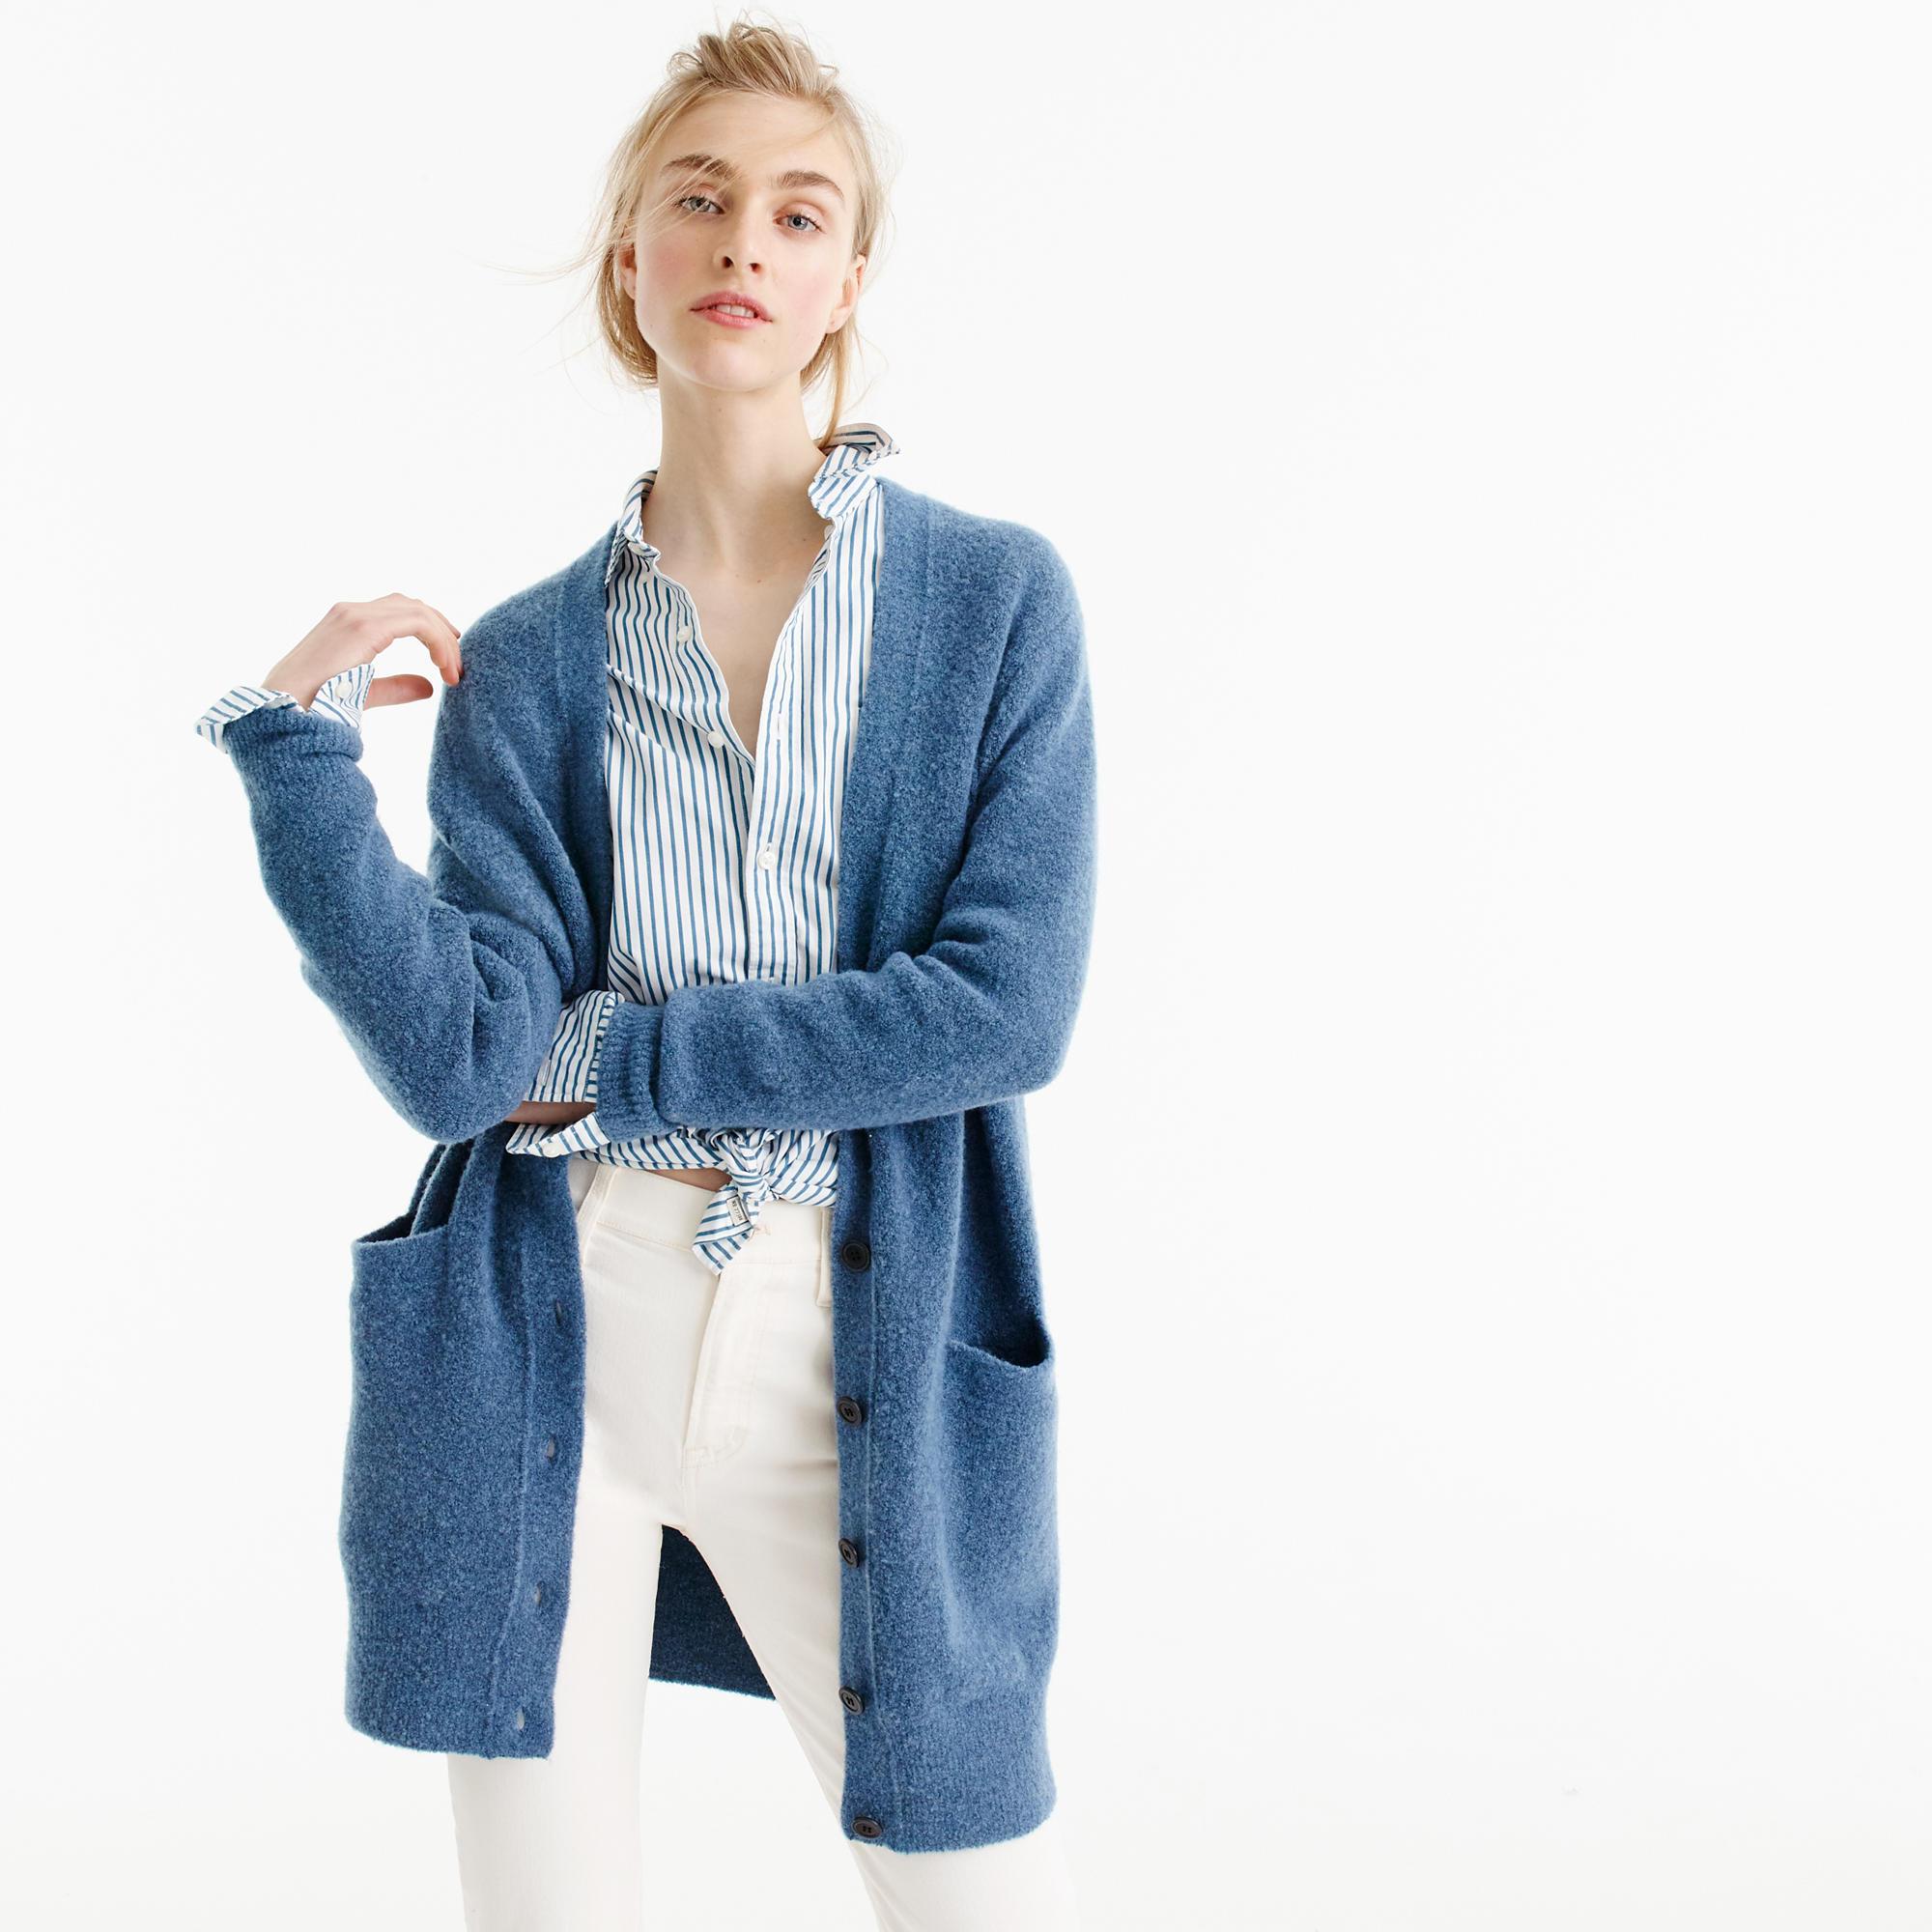 Stretch BouclÉ Cardigan Sweater : Women's Sweaters | J.Crew